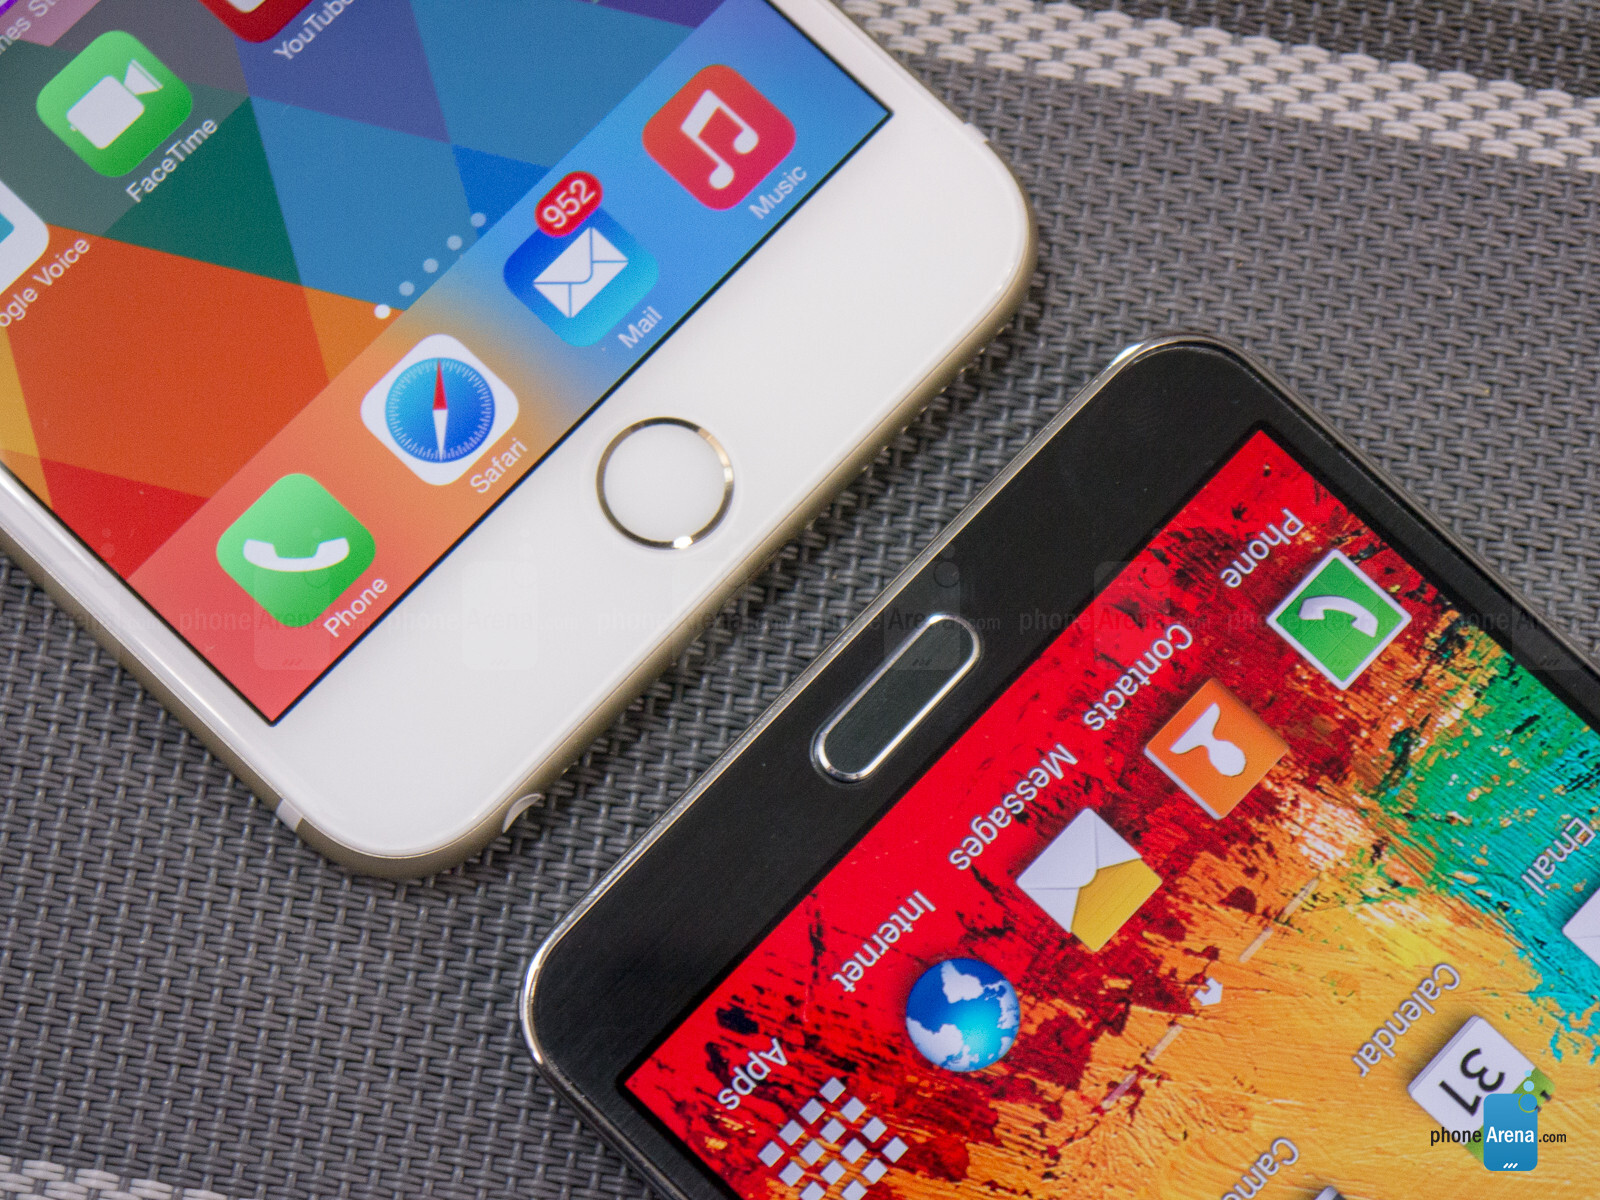 apple iphone 6 plus vs samsung galaxy note 3. Black Bedroom Furniture Sets. Home Design Ideas